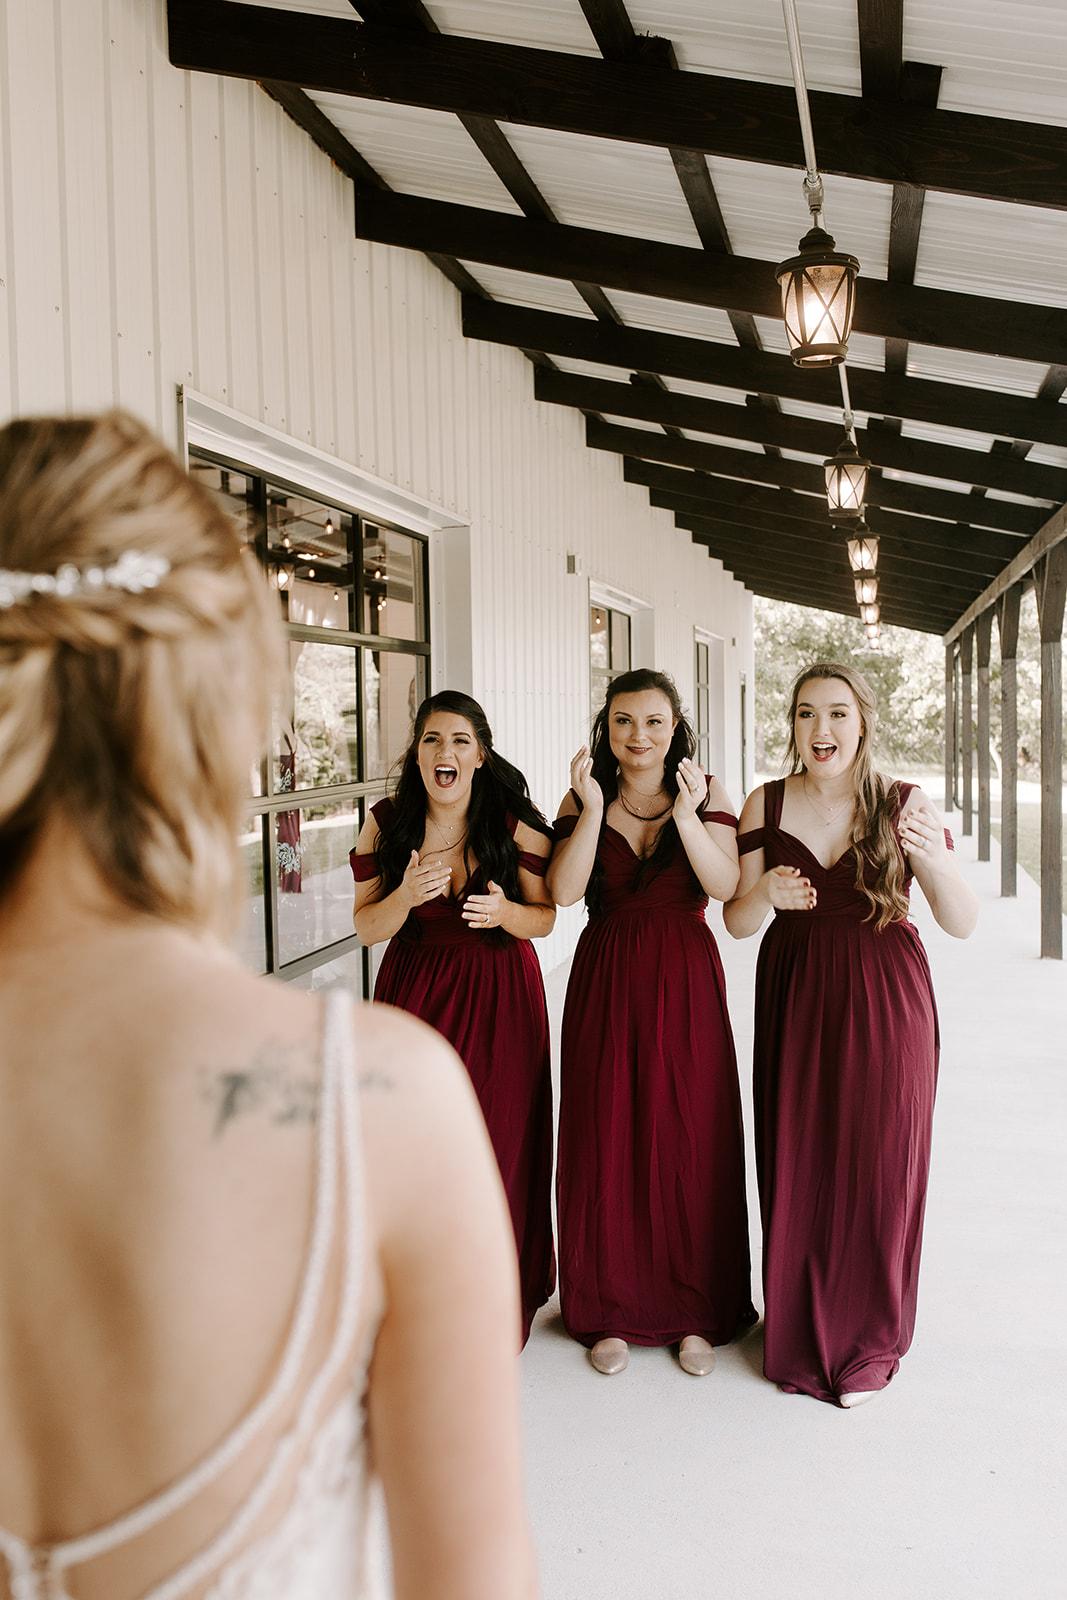 Wedding Venues in Tulsa white barn Dream Point Ranch 22.jpg